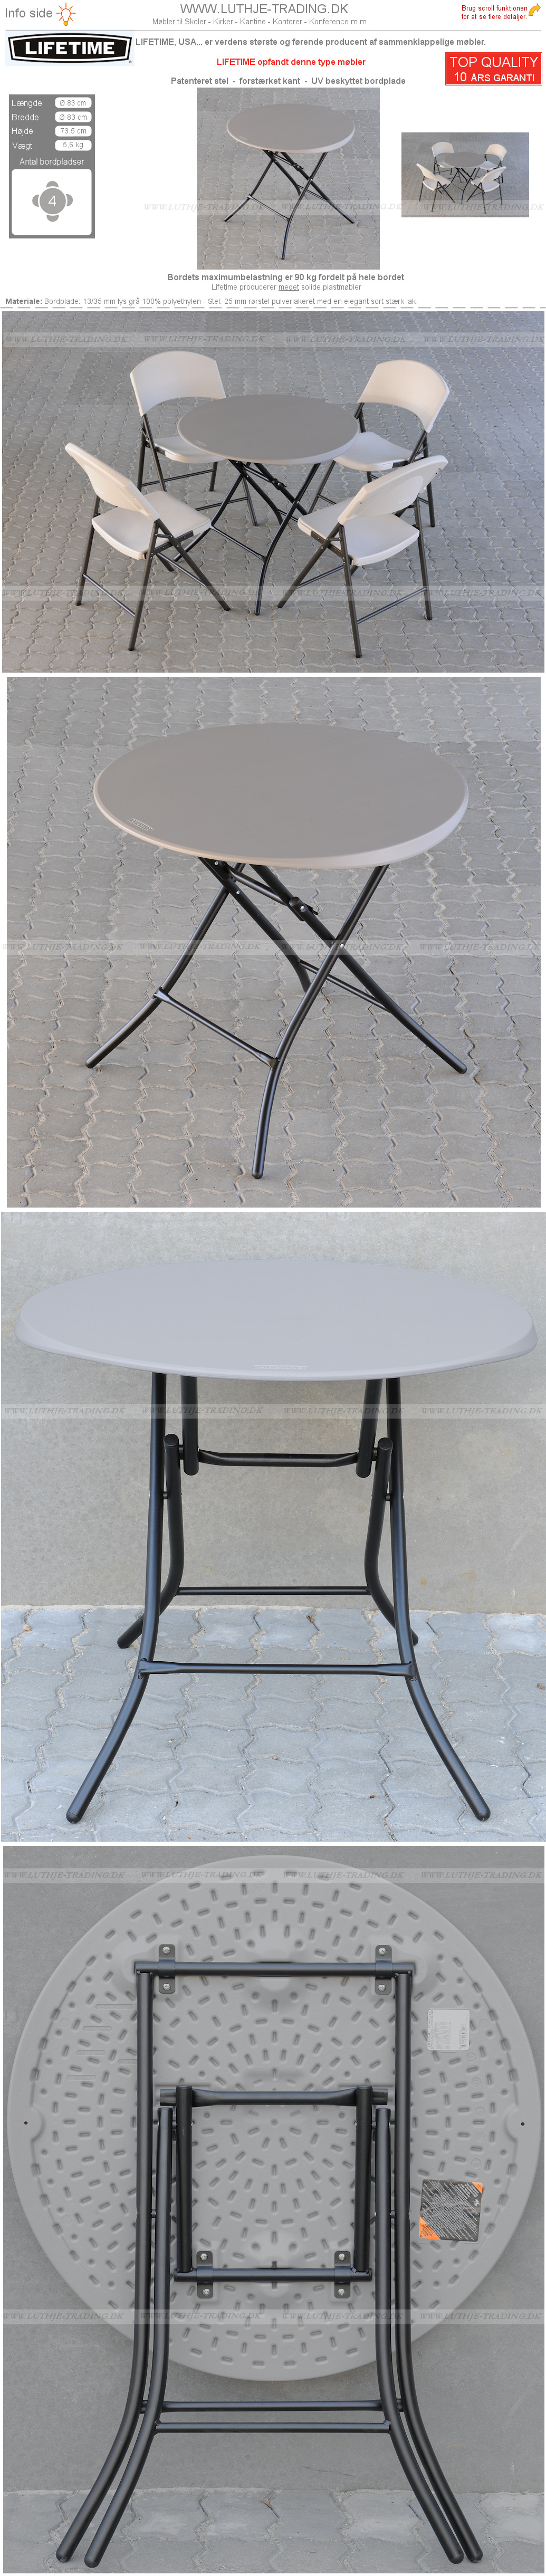 Rundt bord Lifetime Ø83 cm plast med klapstel